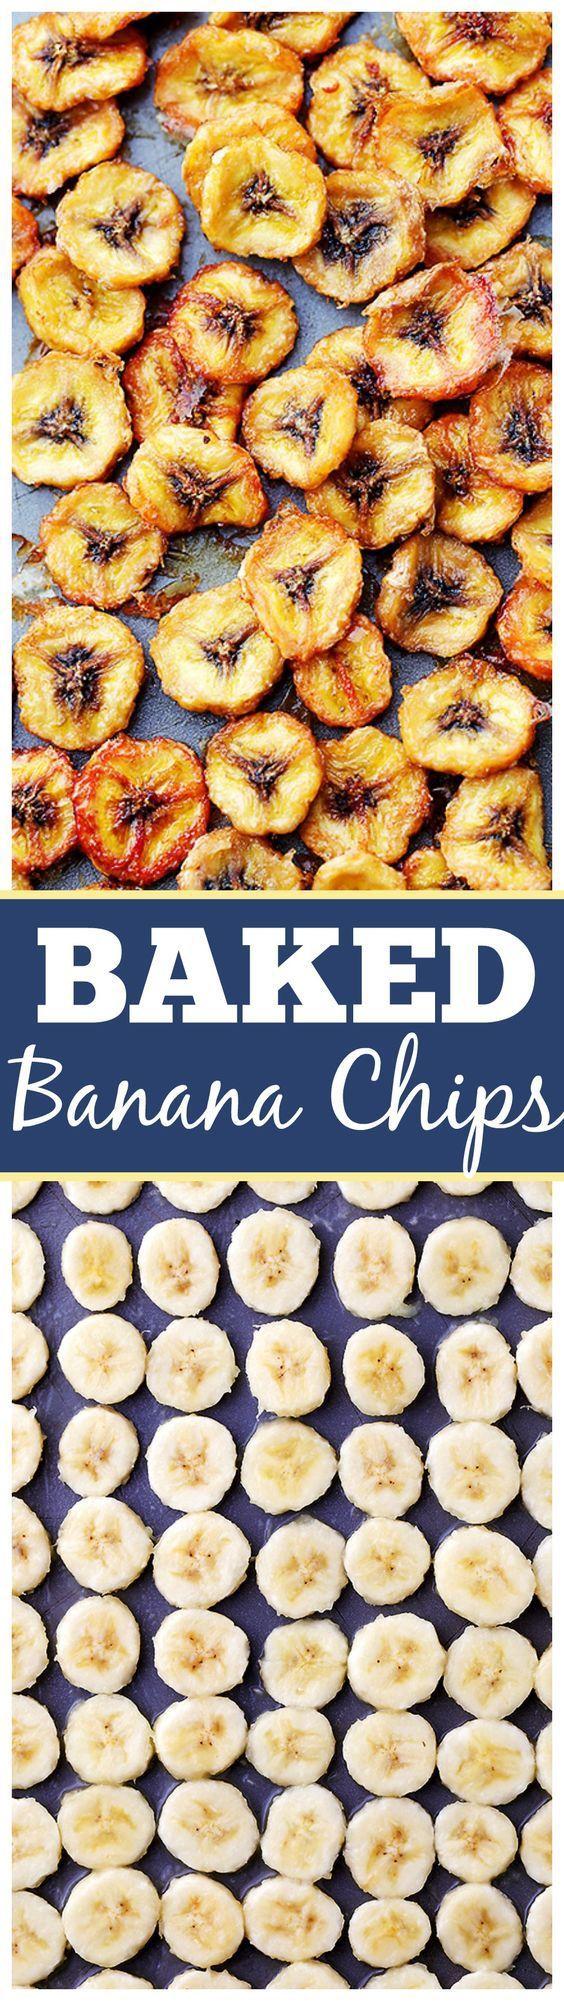 Homemade Baked Banana Chips – Deliciously sweet and guilt-free baked banana…